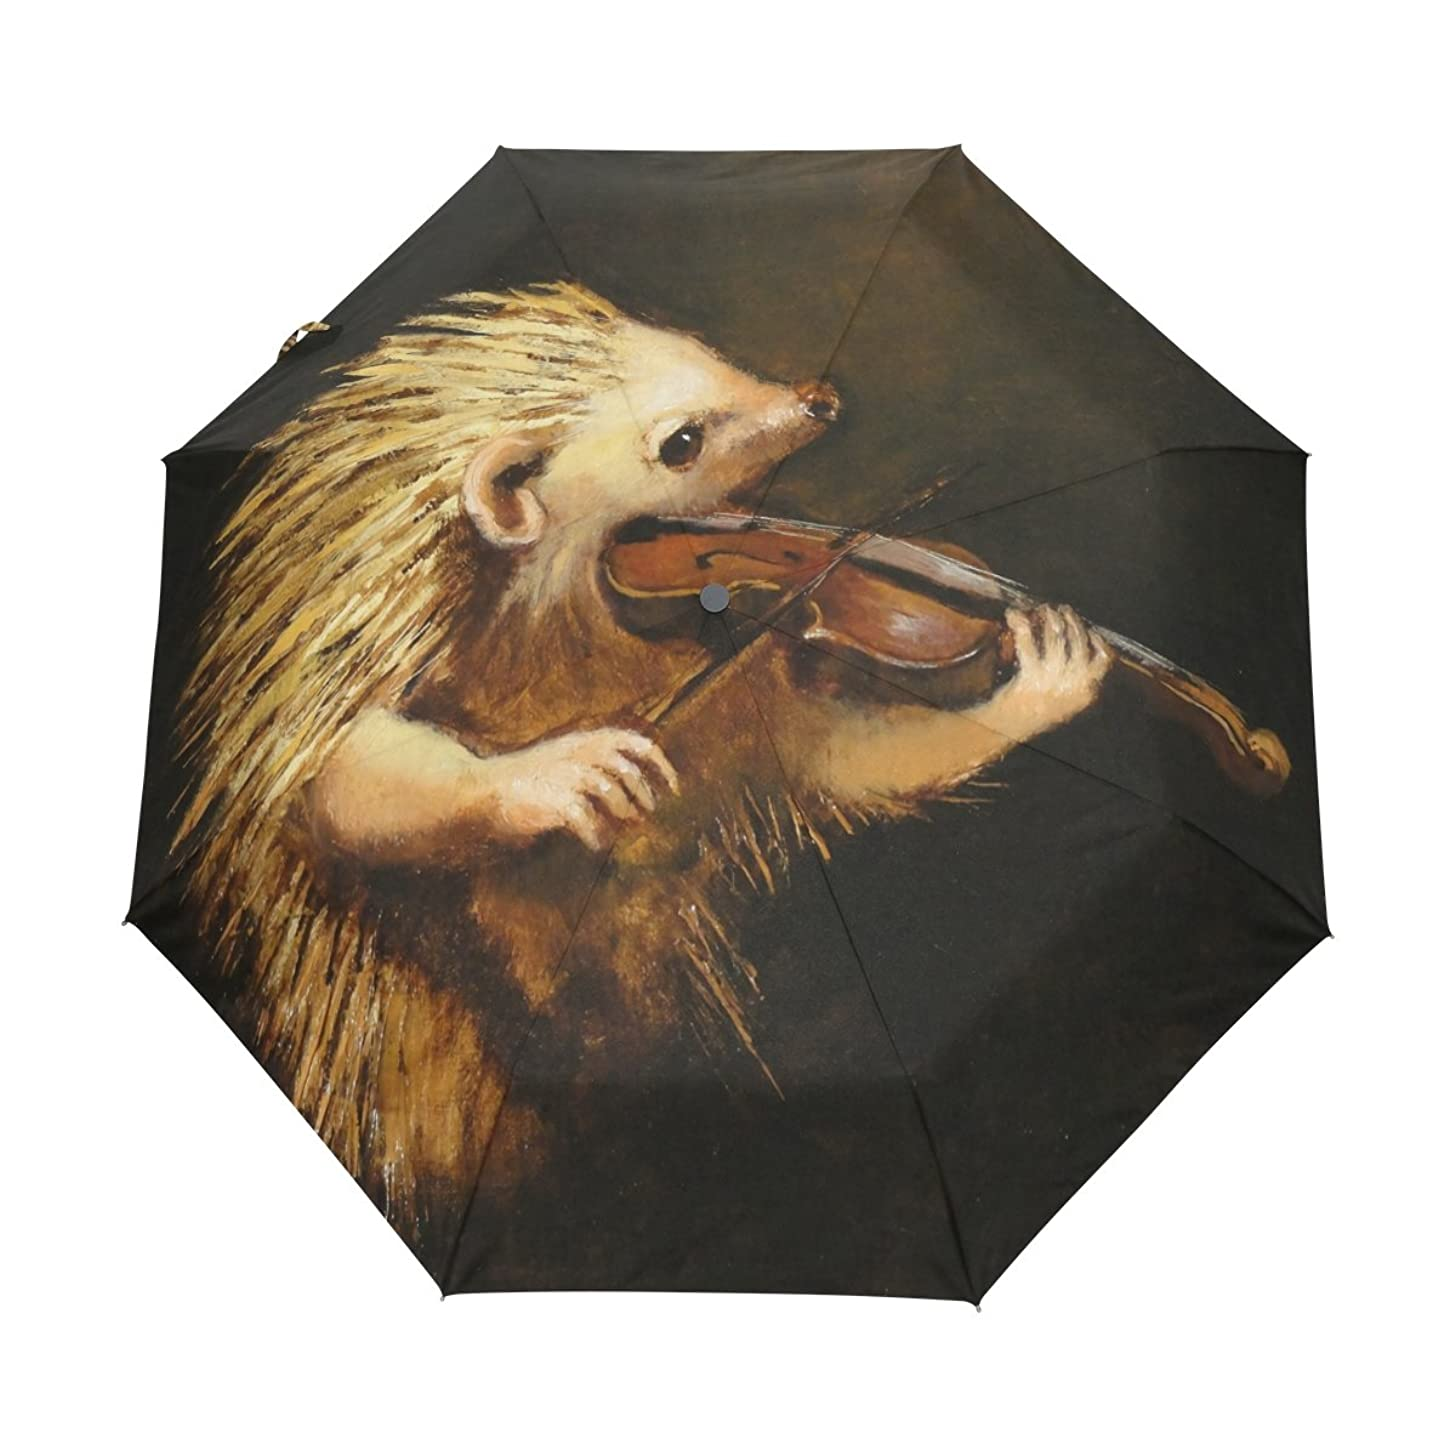 Ethel Ernest Folding Windproof Umbrella Hedgehog Playing Violin Waterproof Auto Foldable Umbrella